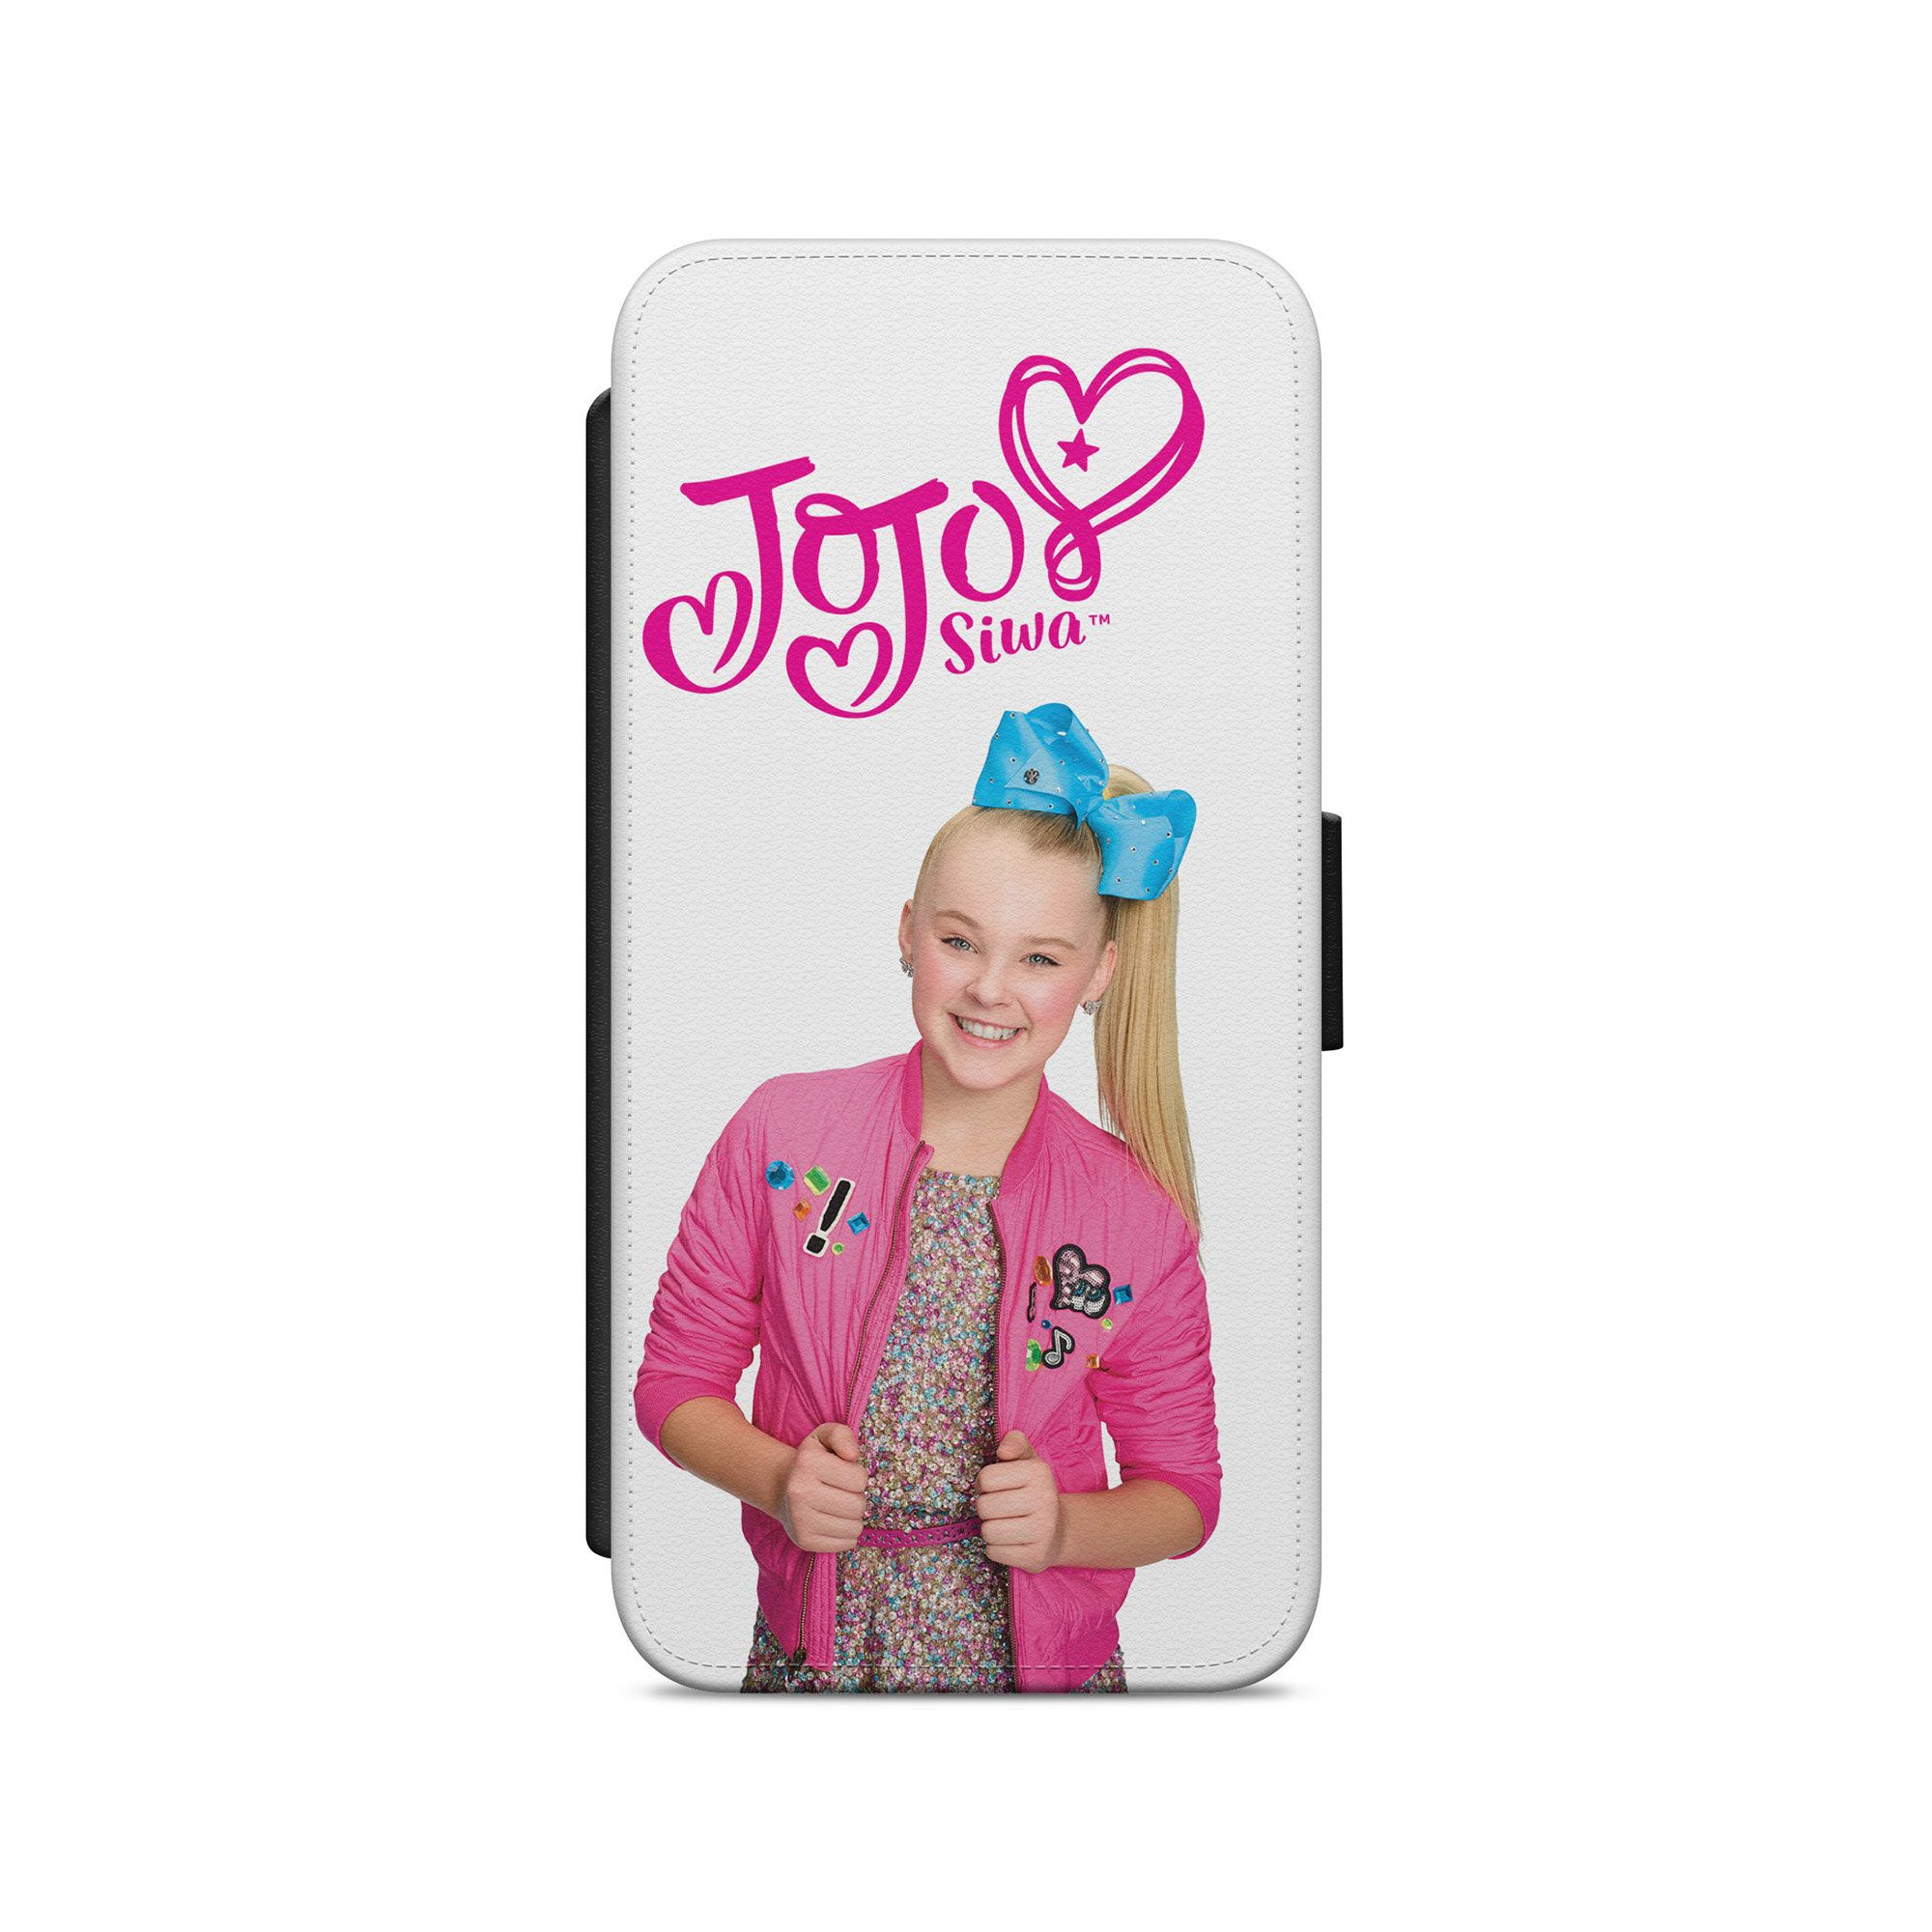 Jojo siwa youtube blogger leather wallet flip phone case